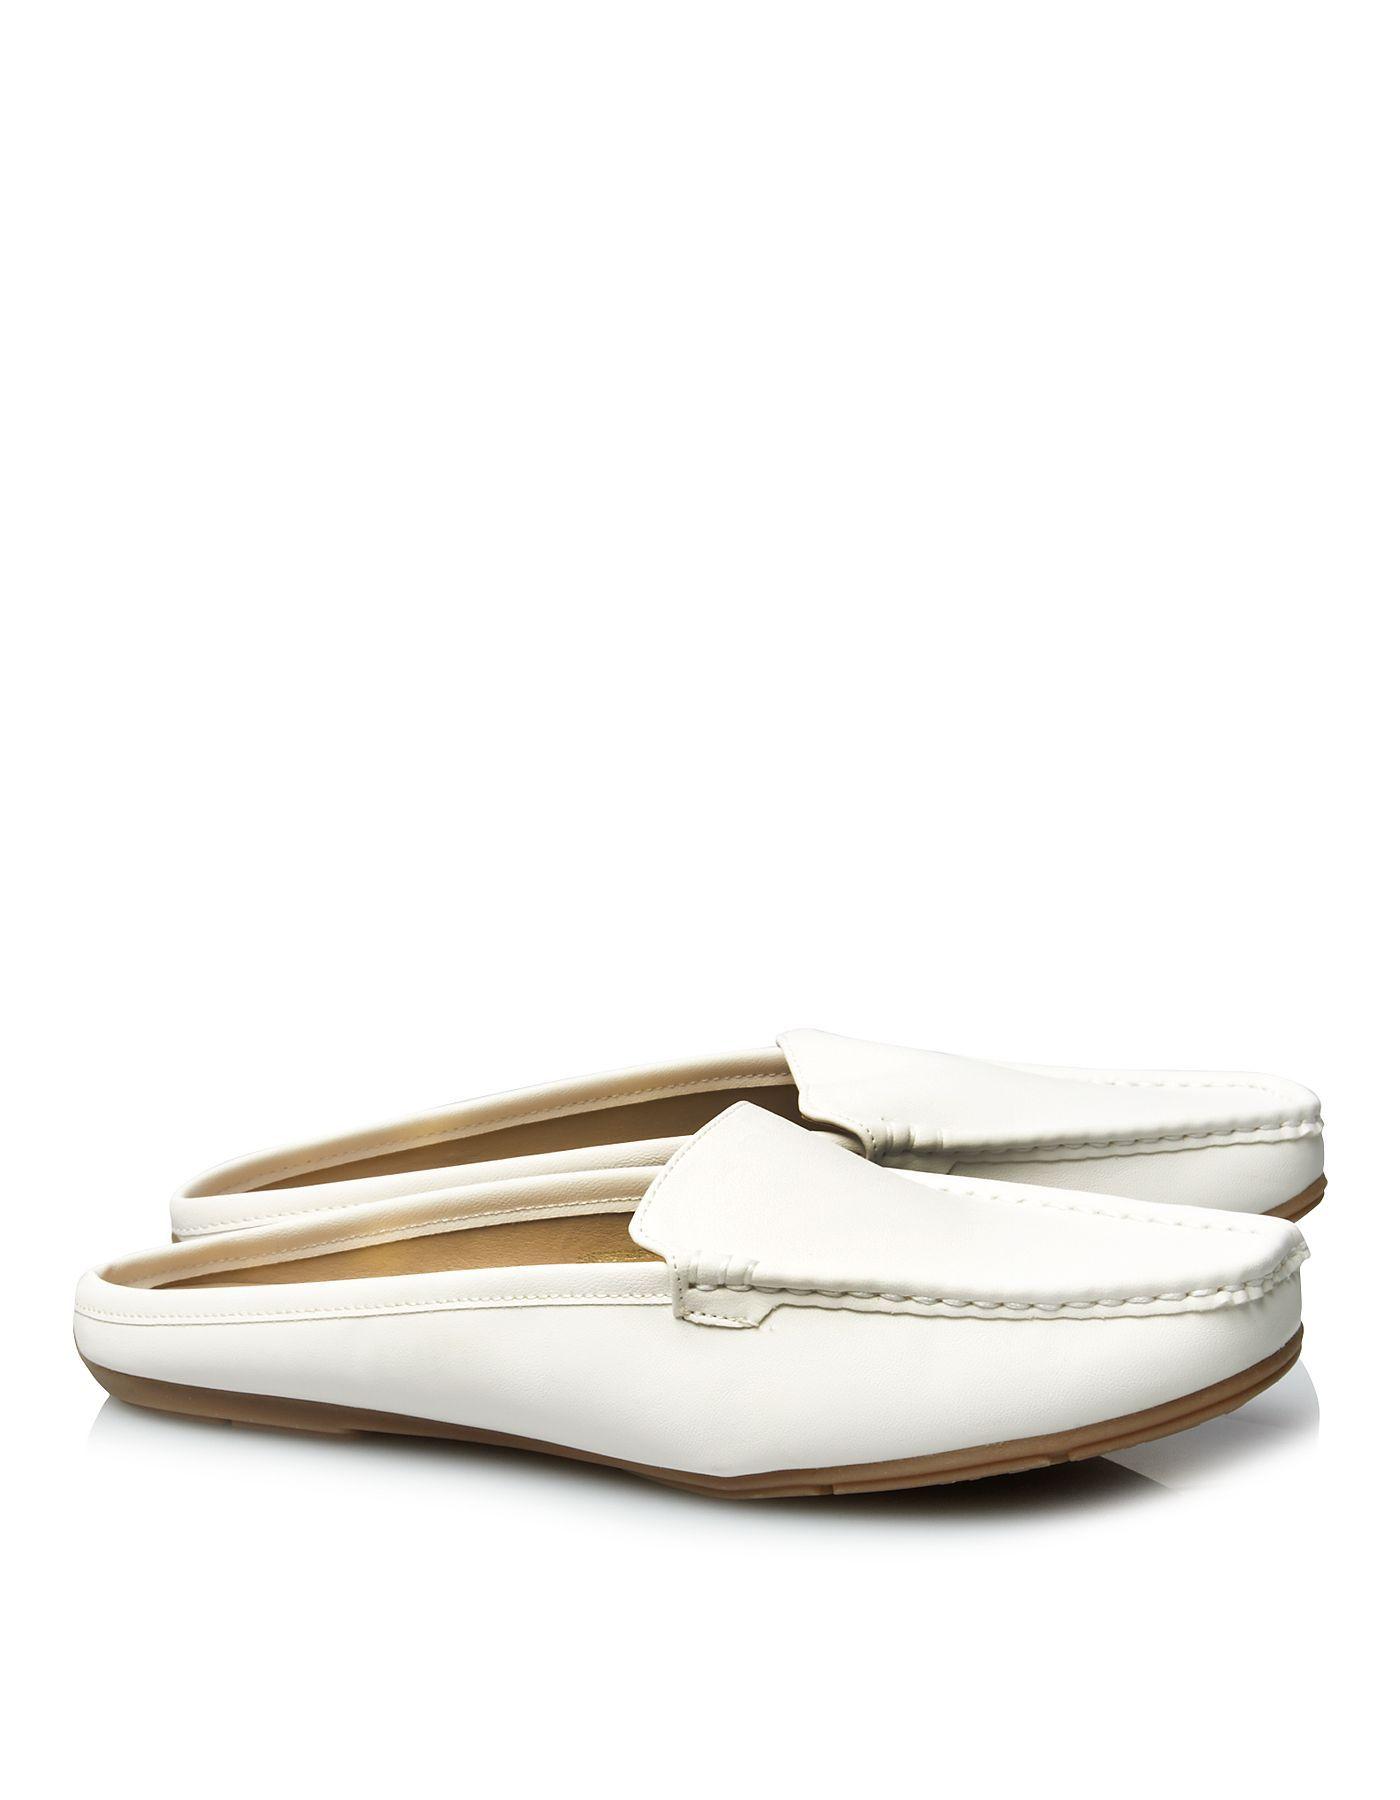 backless loafer shoes women george at asda pin board. Black Bedroom Furniture Sets. Home Design Ideas